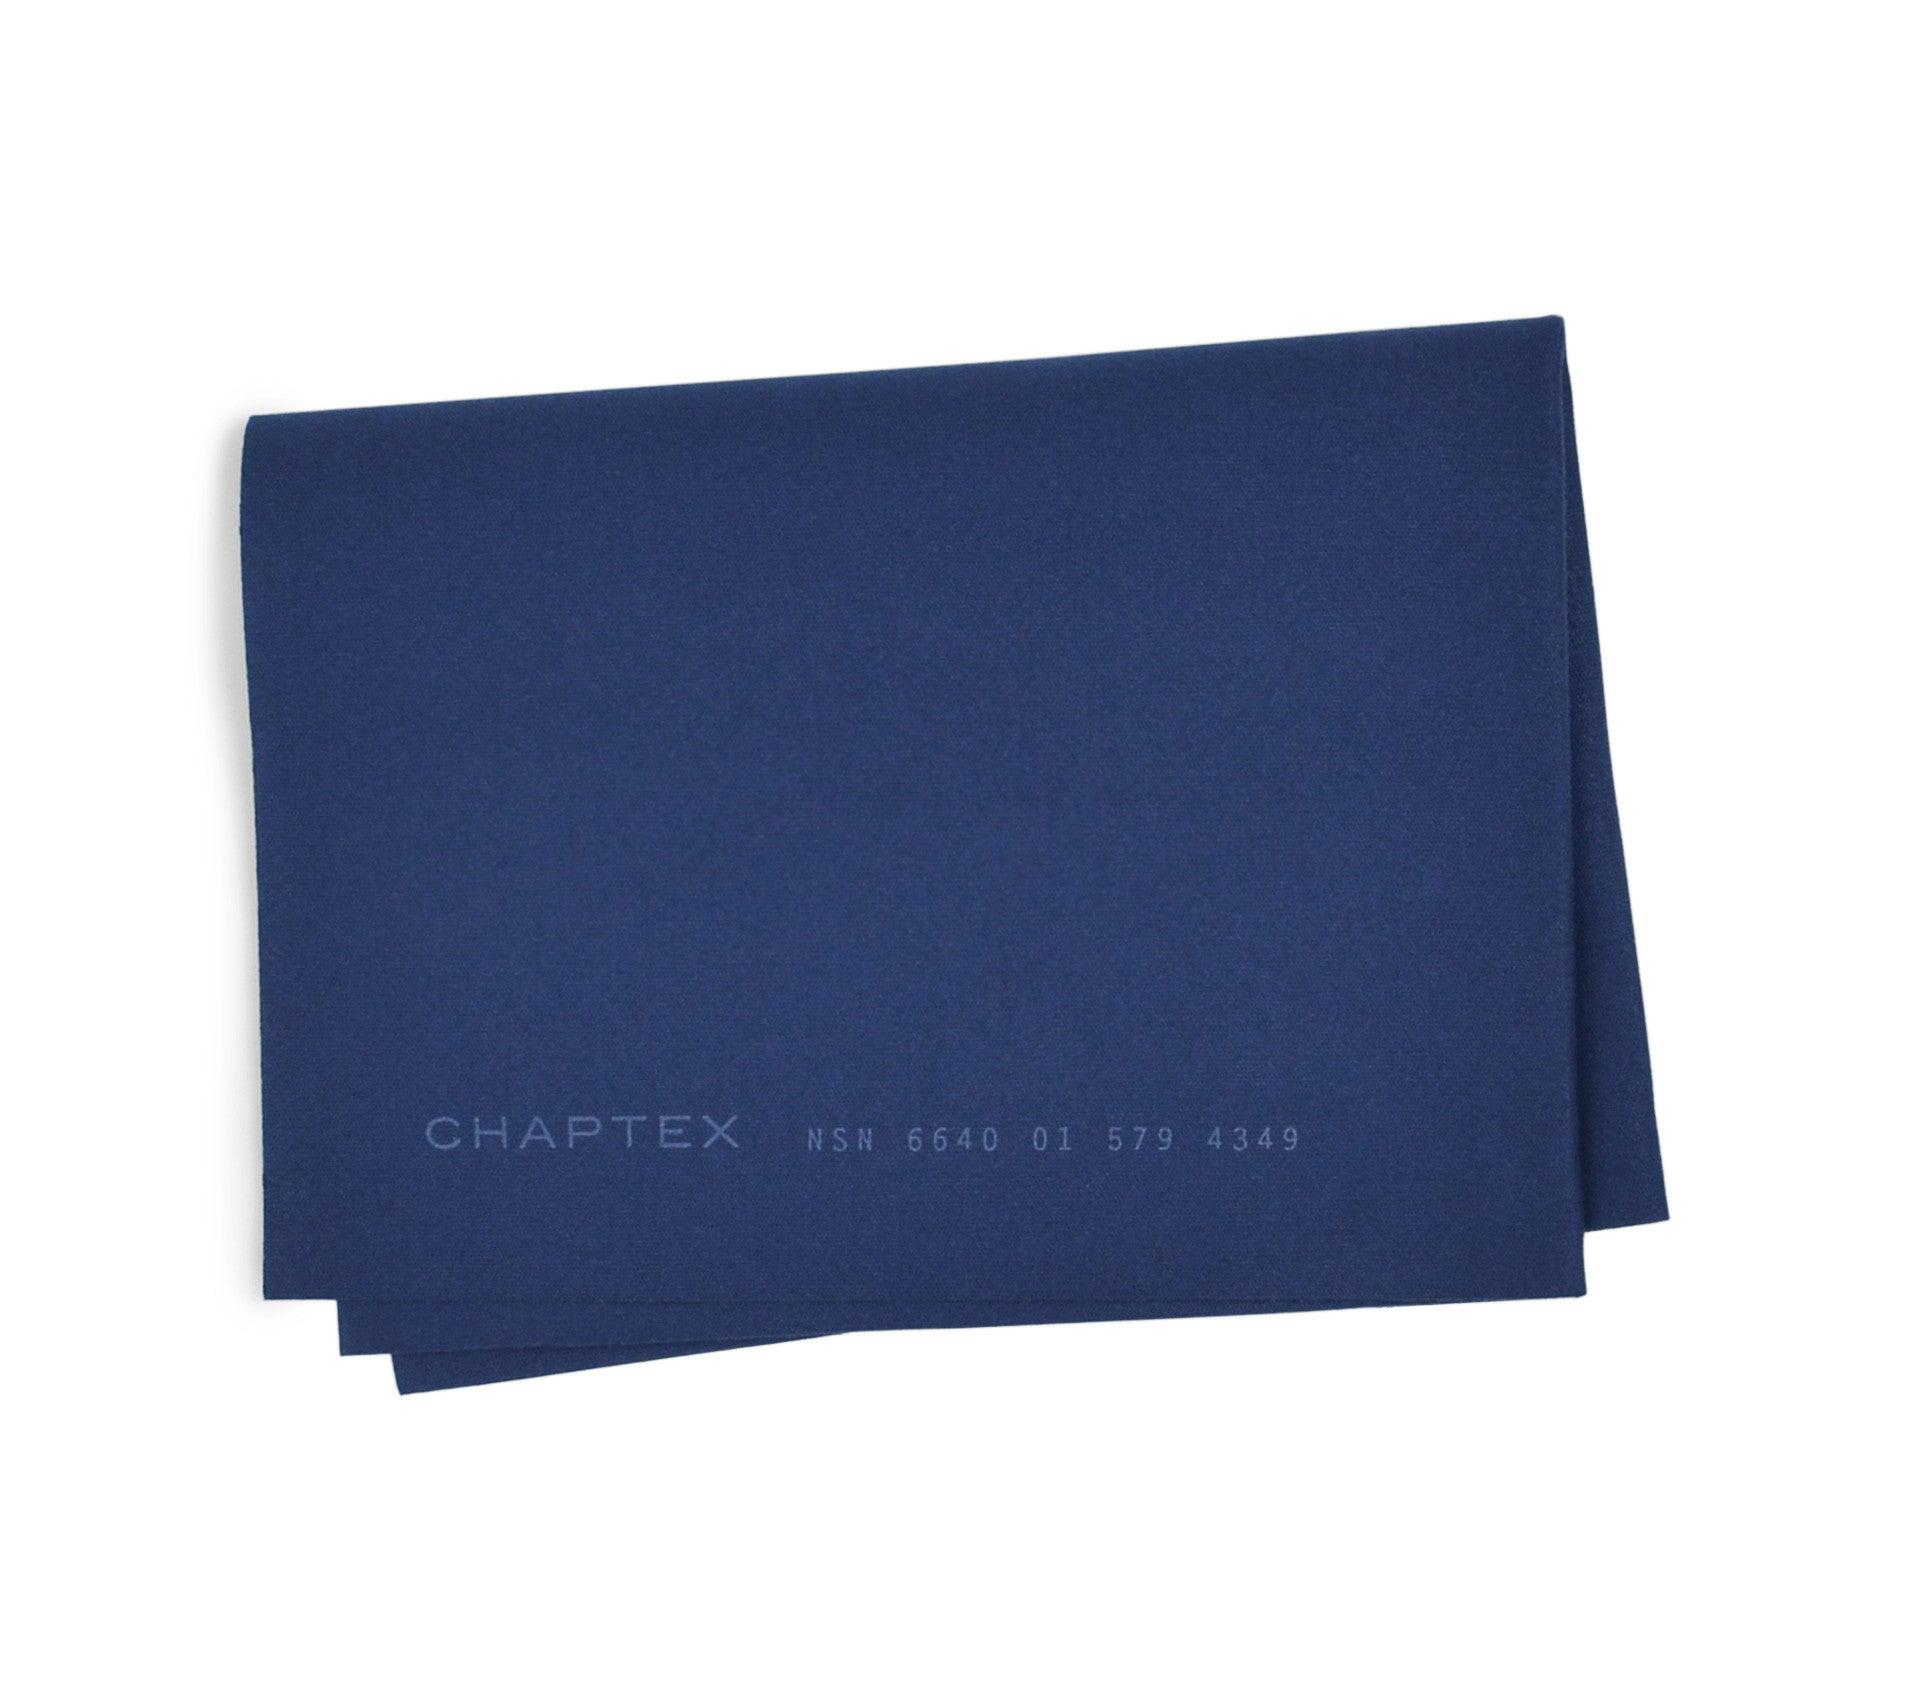 Chaptex Cloth